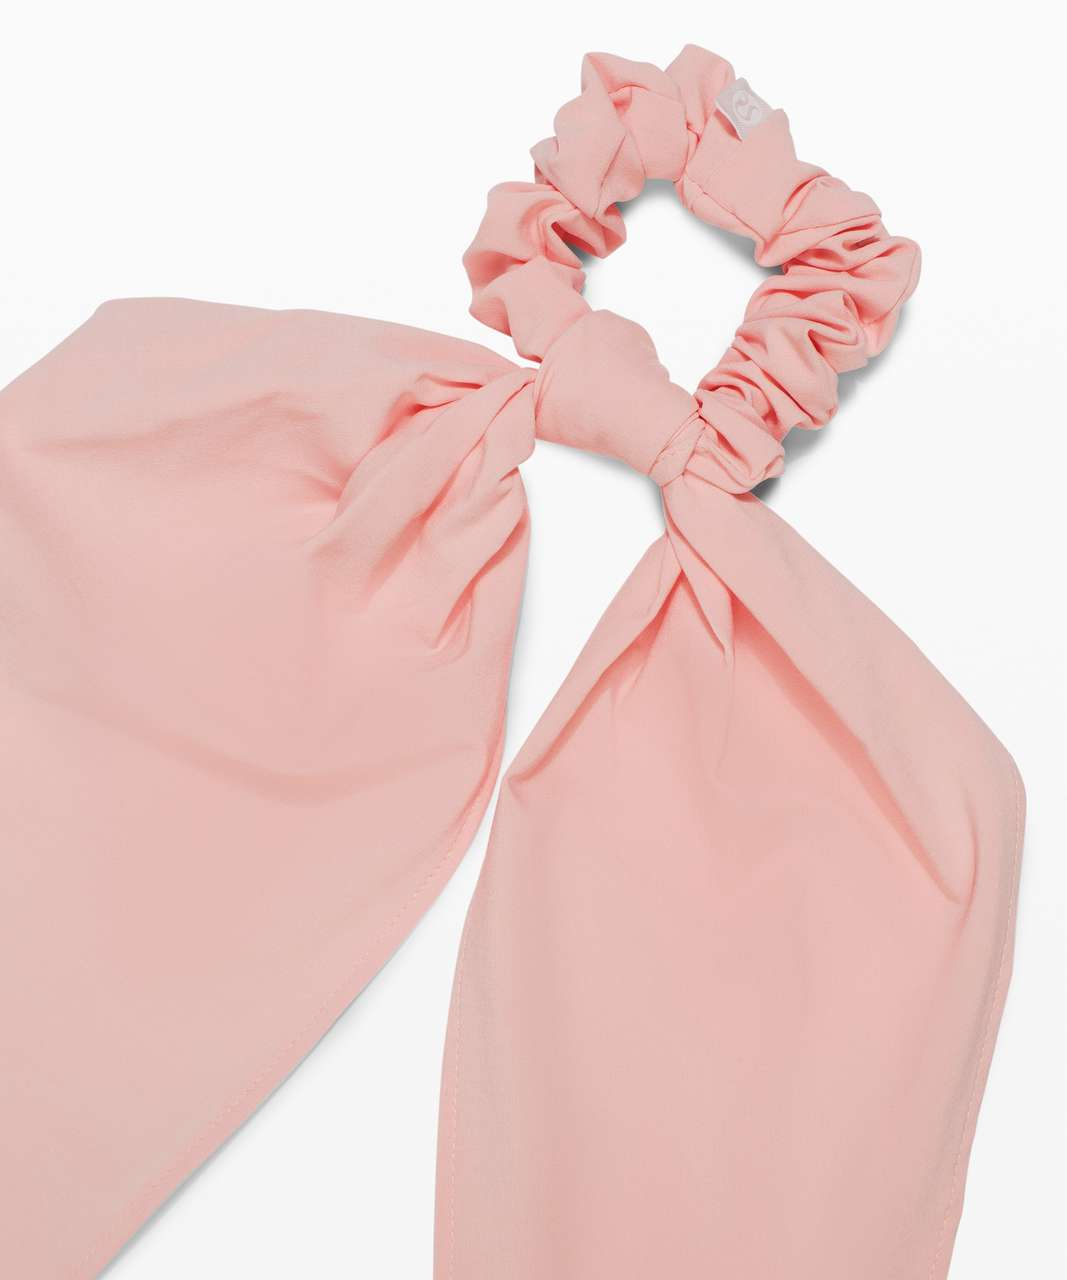 Lululemon Uplifting Scrunchie *Flow - Misty Pink